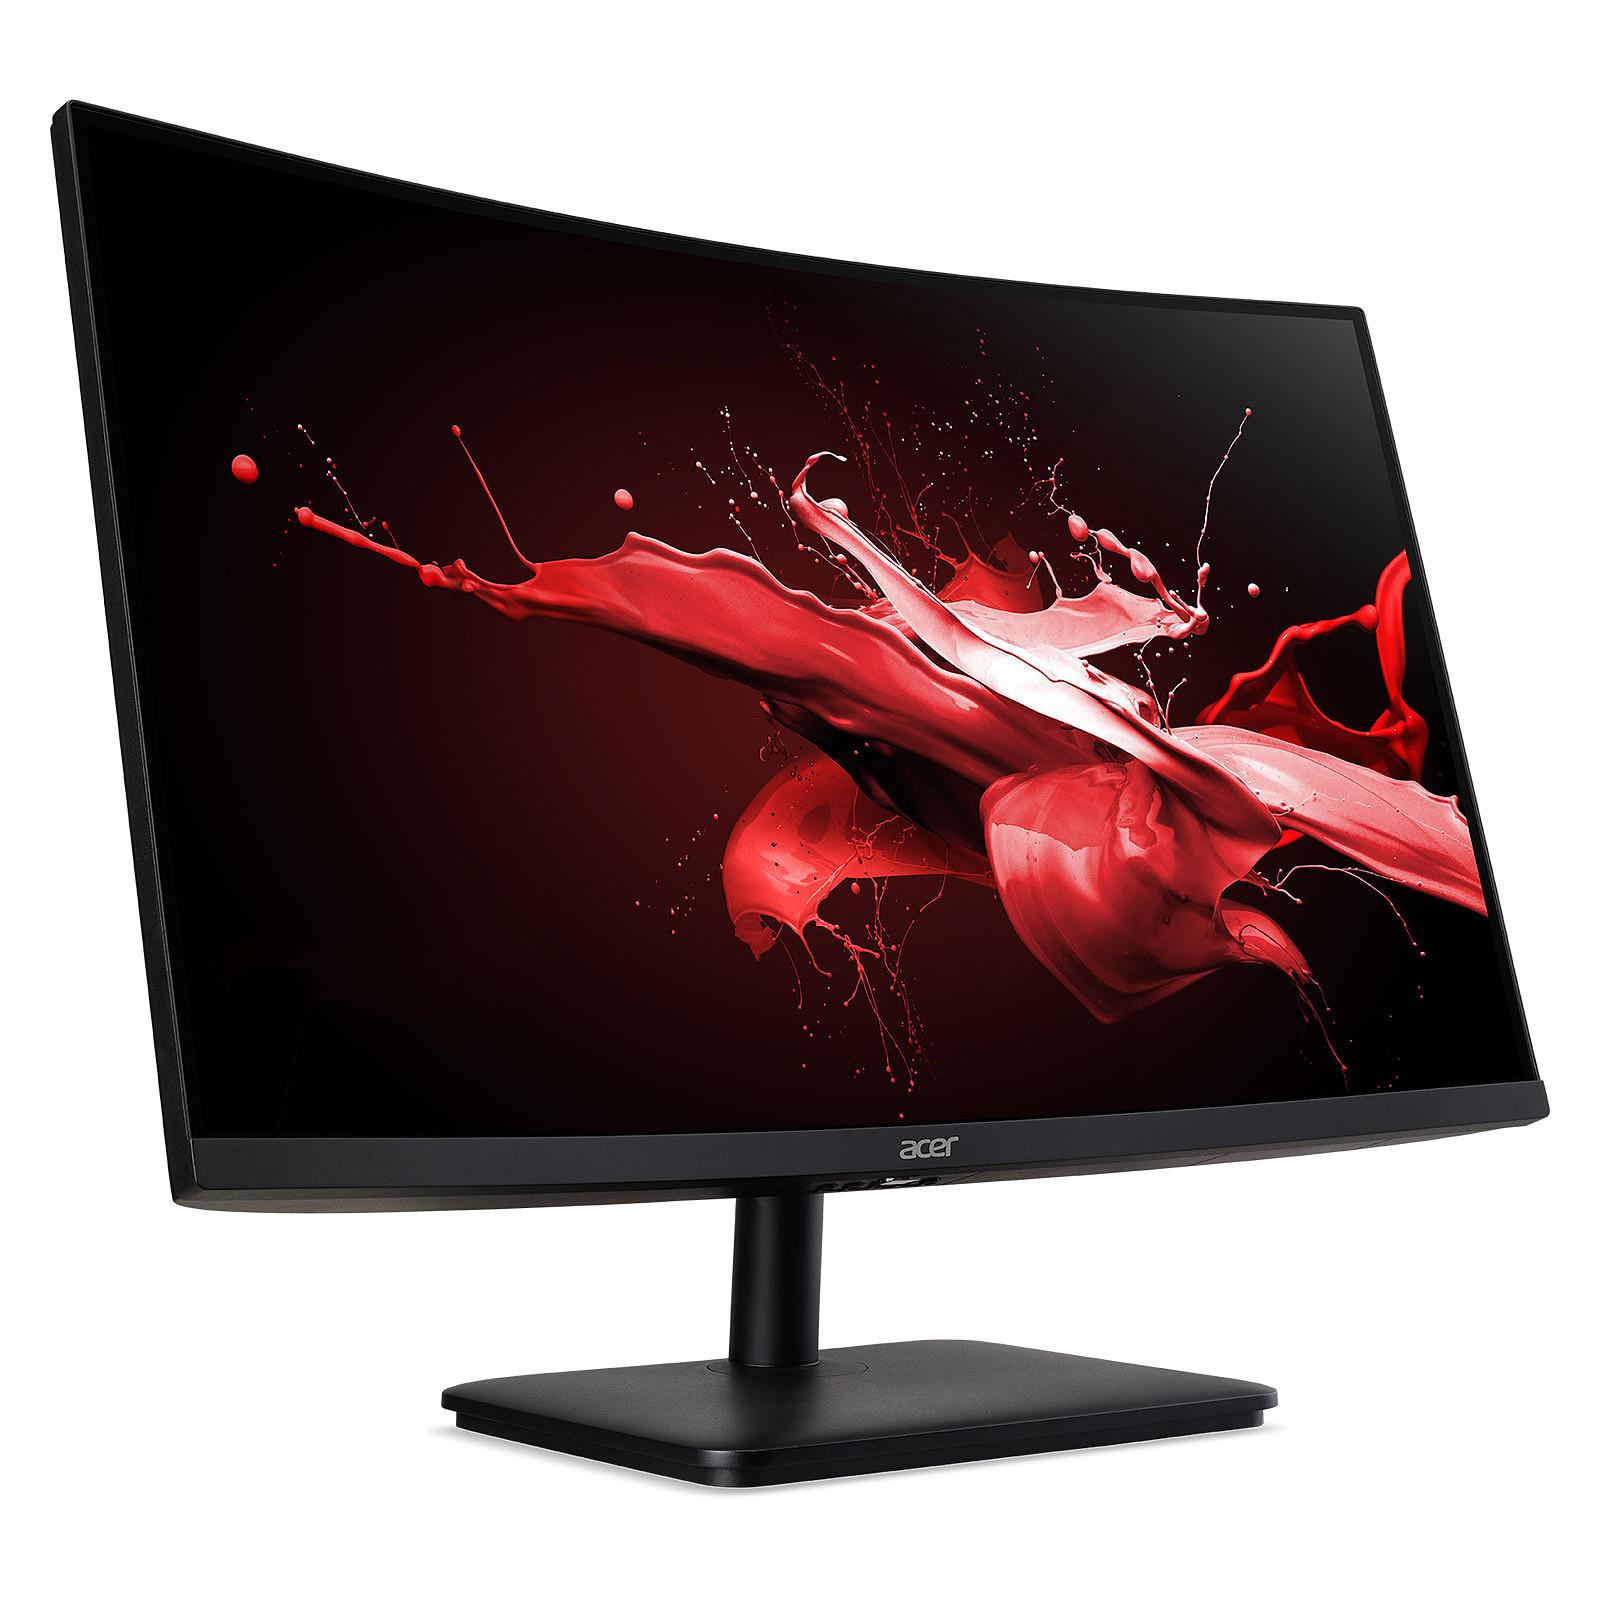 "Écran PC gaming 27"" Acer ED270UPbiipx - WQHD, 165 Hz, Dalle VA, Incurvé, 1 ms"